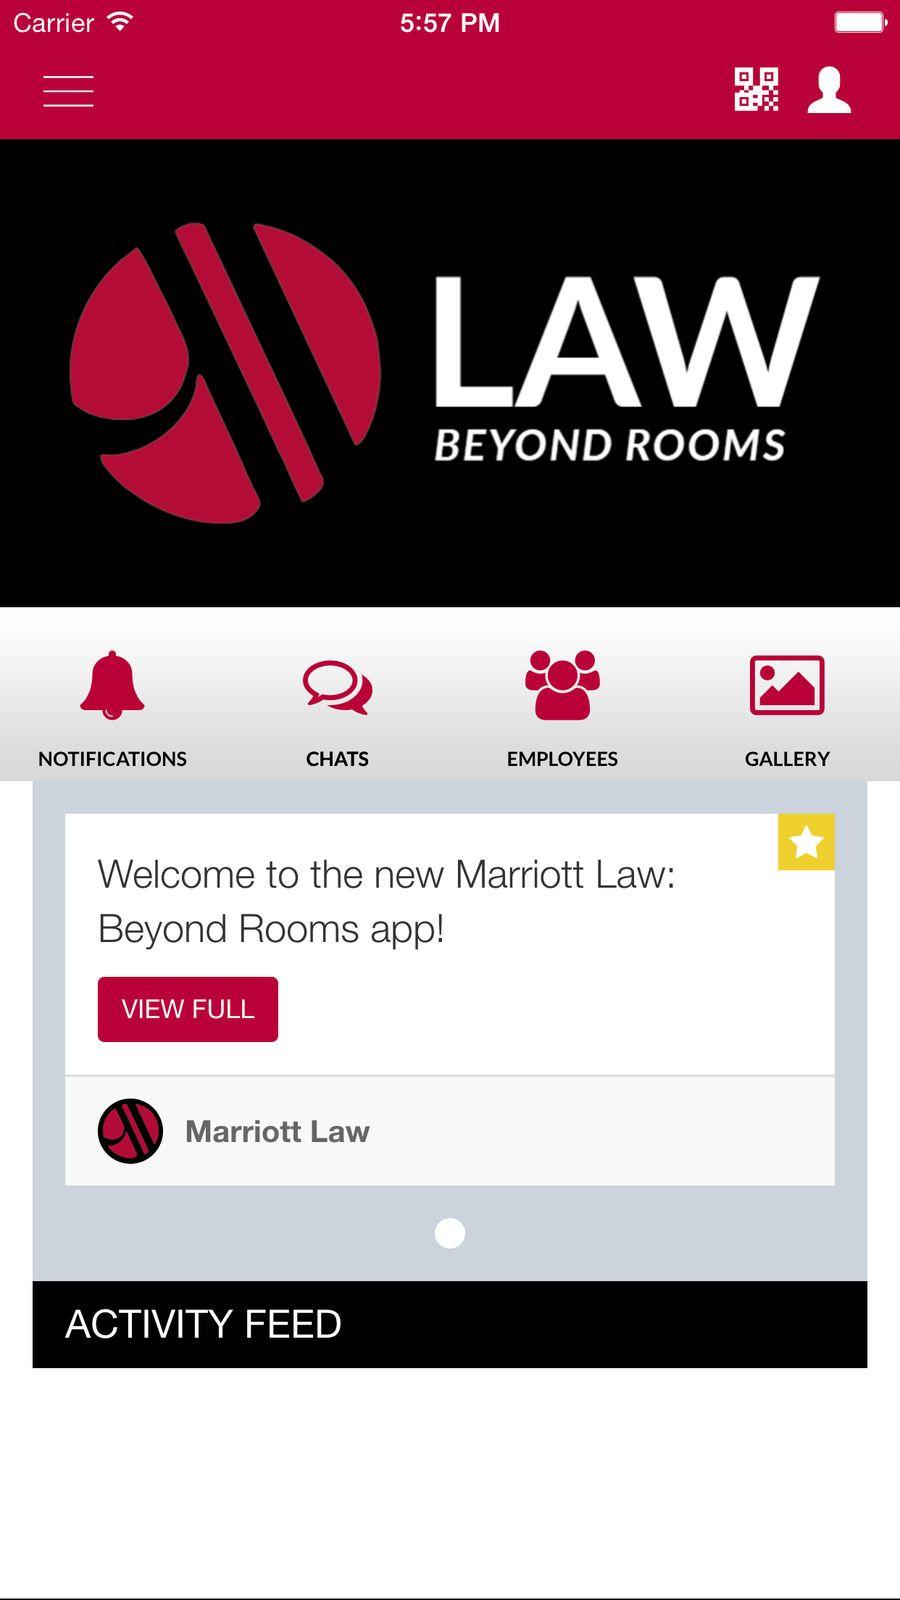 Marriott law beyond rooms entertainmentbusinessapps